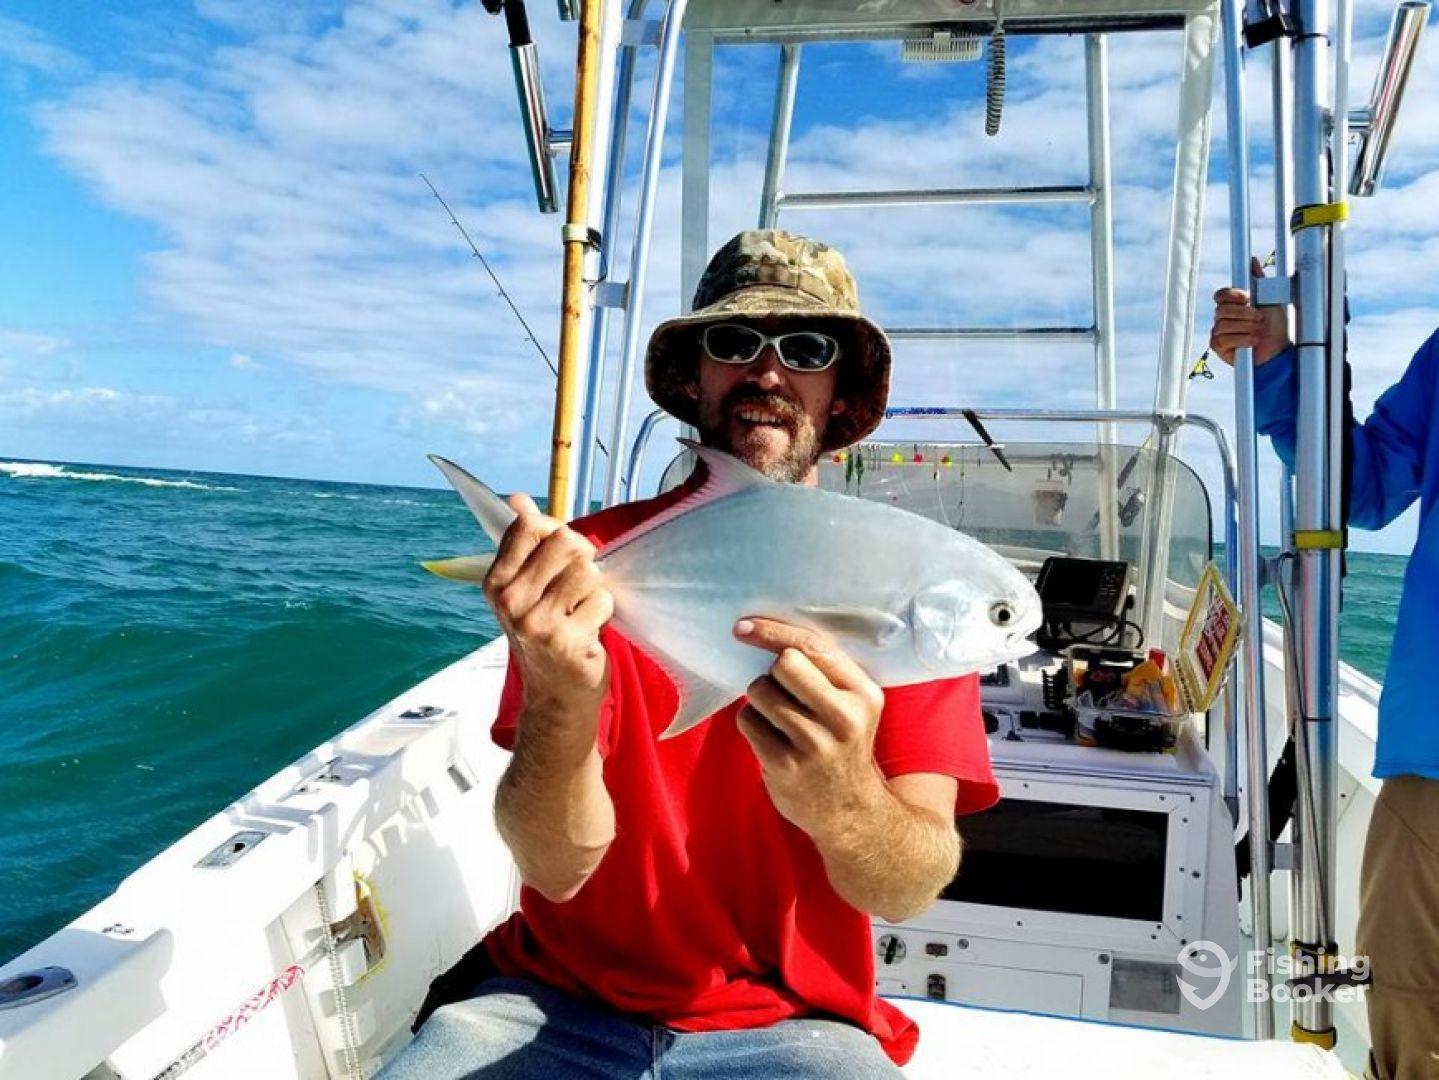 Treasure coast fishing charters stuart fl fishingbooker for Stuart fishing charter